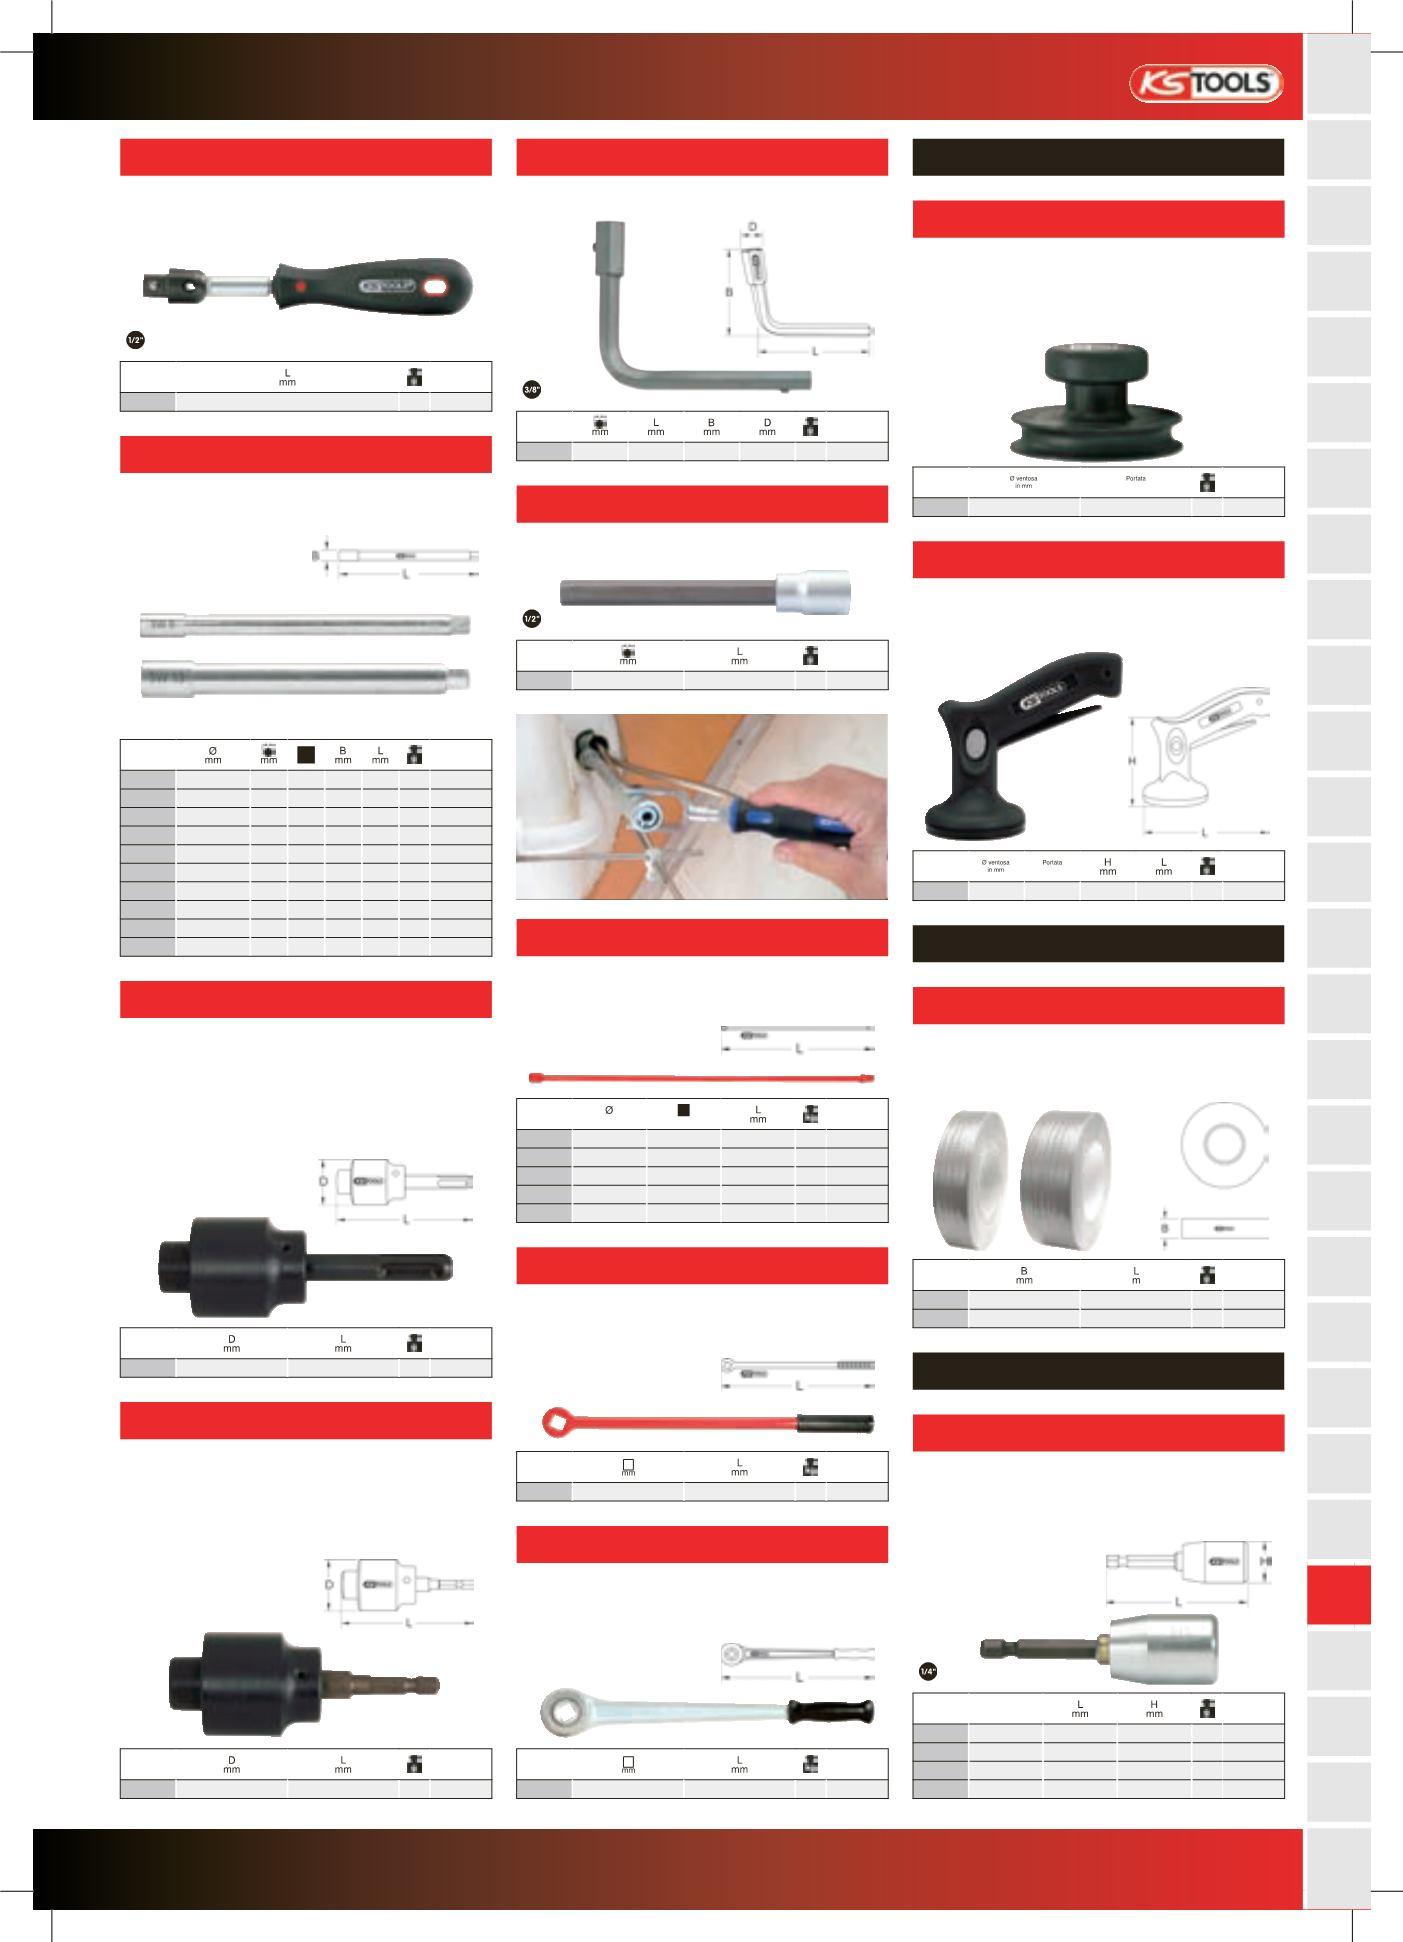 KS Tools 116.2039 Inserto prolunga per rubinetto